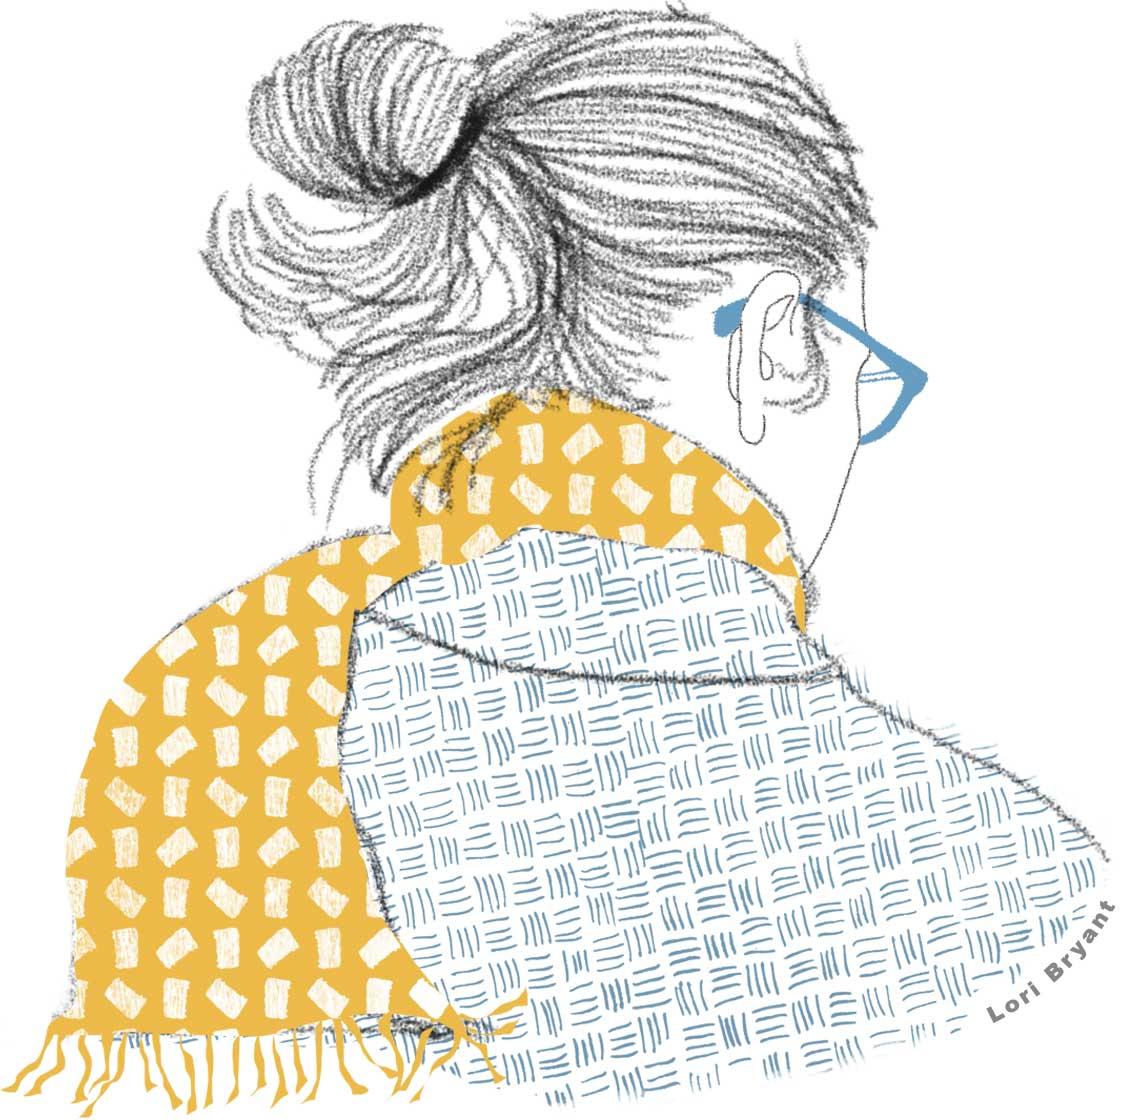 Laura J. Bryant (Lori Bryant) portrait